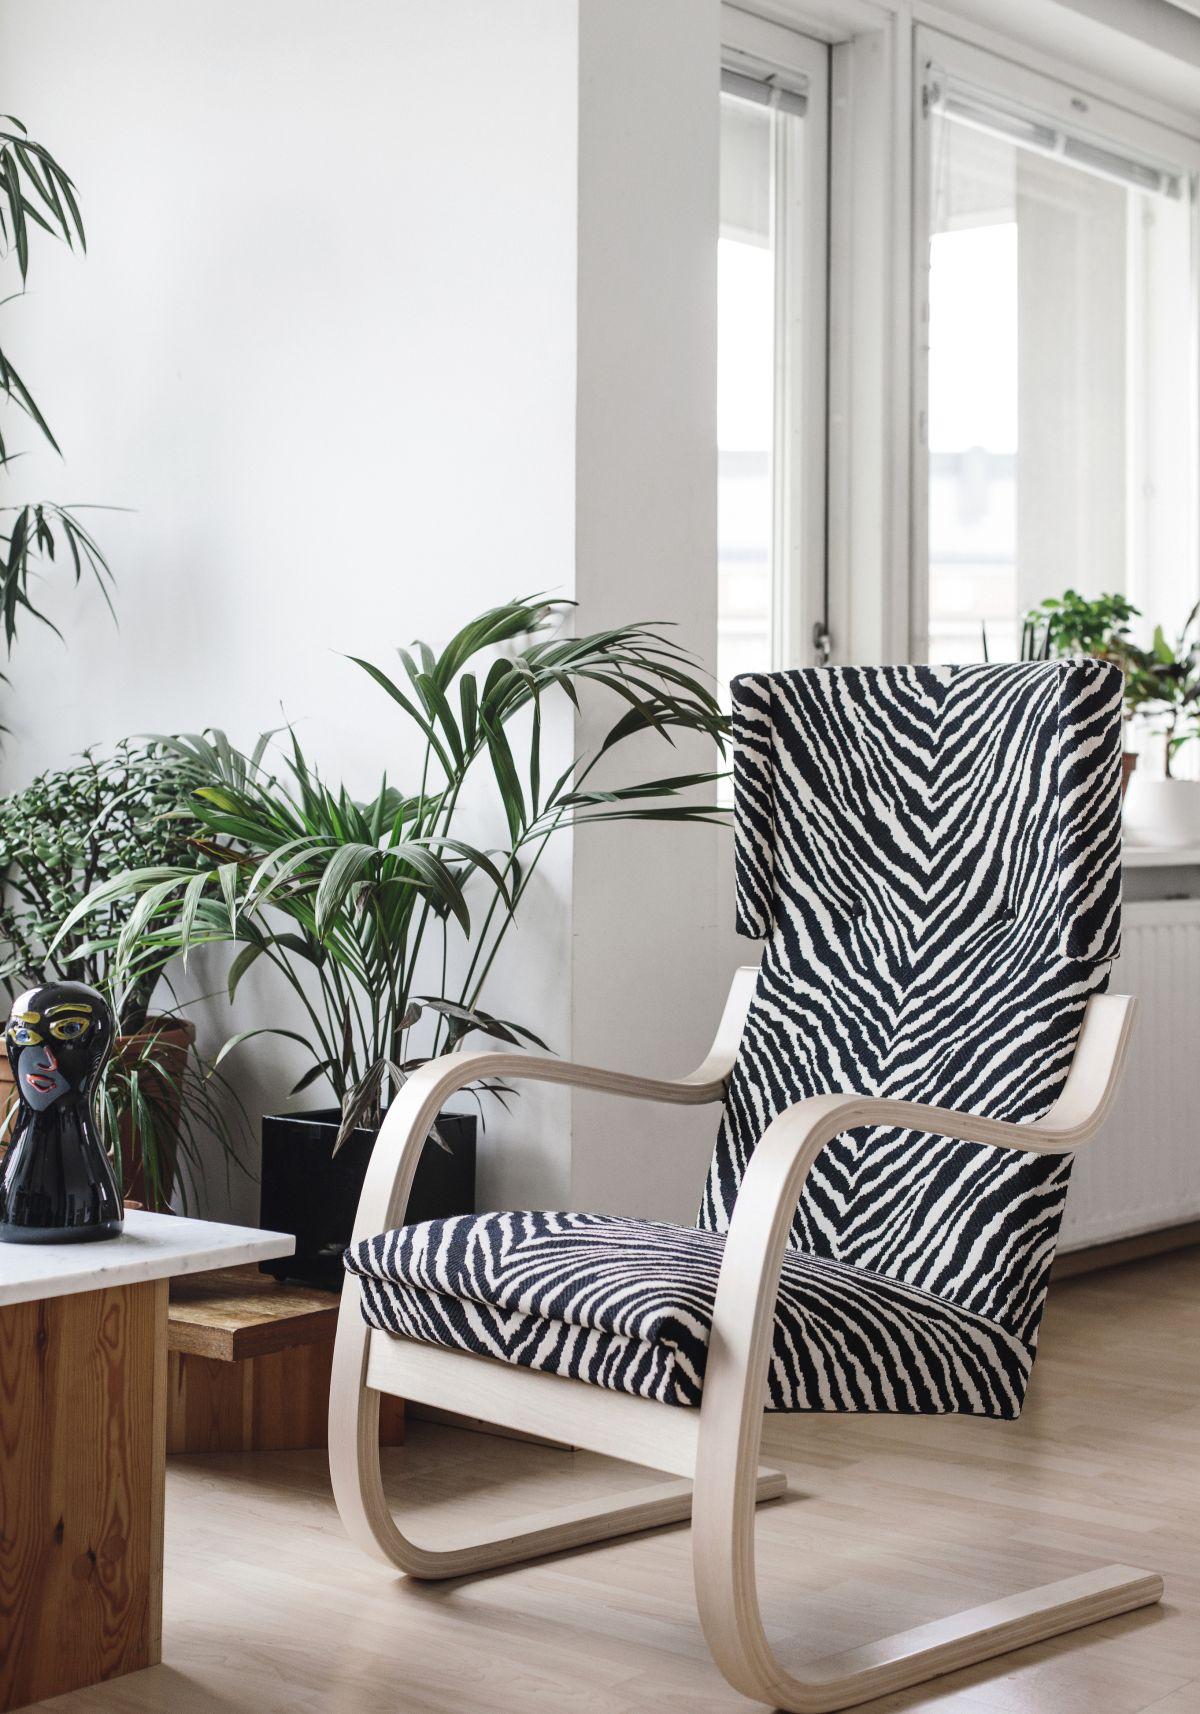 Armchair-401-Zebra-Upholstery